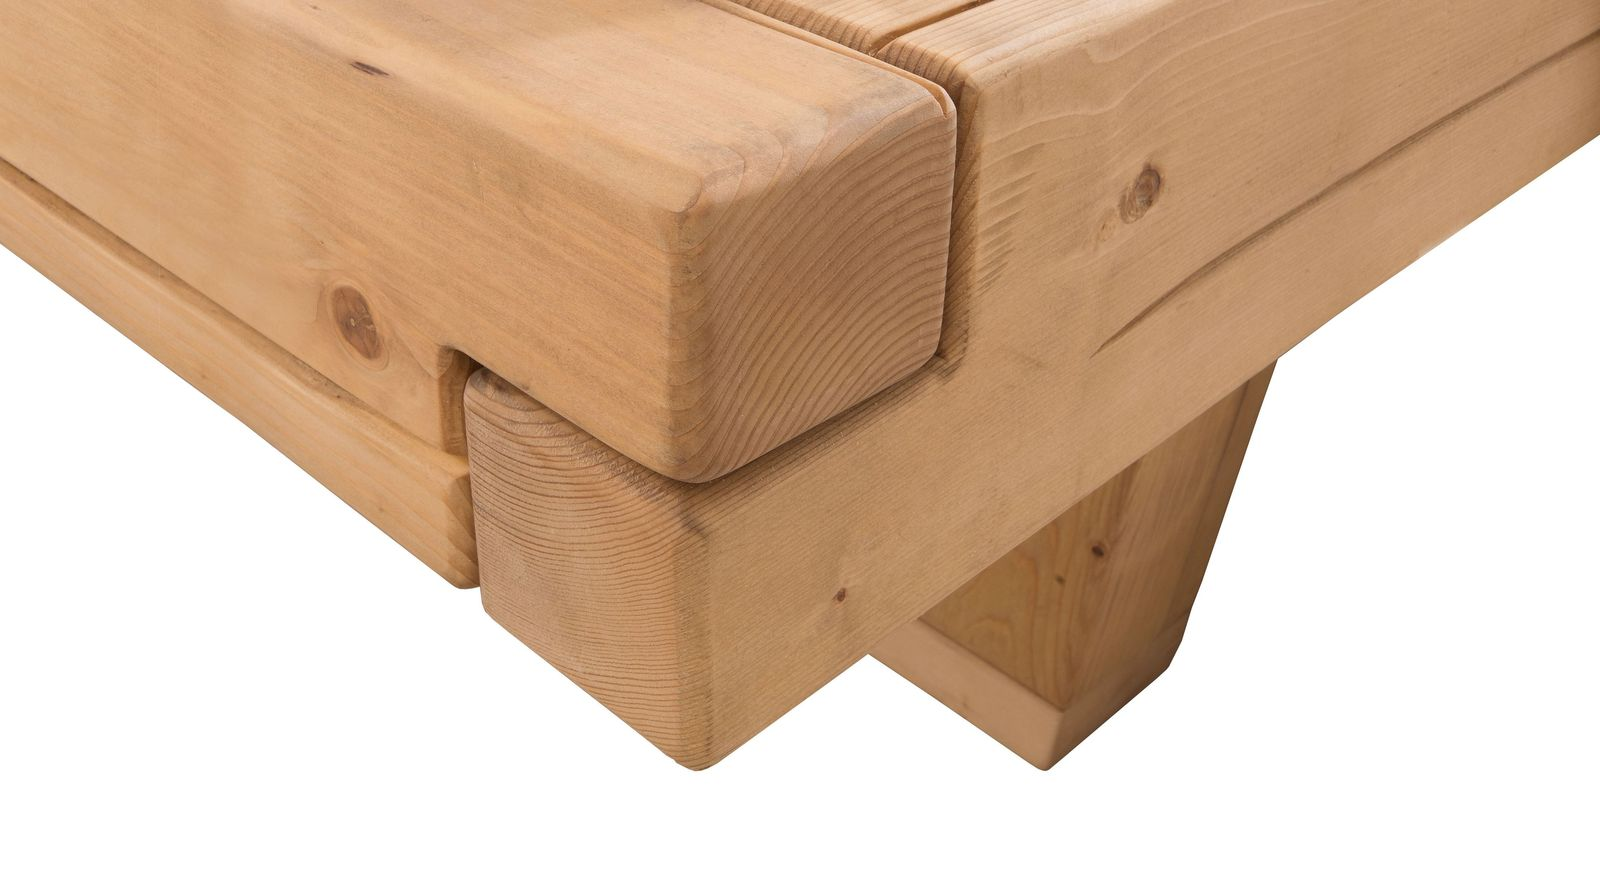 Bett Basiliano mit ausdrucksvoller Holzmaserung